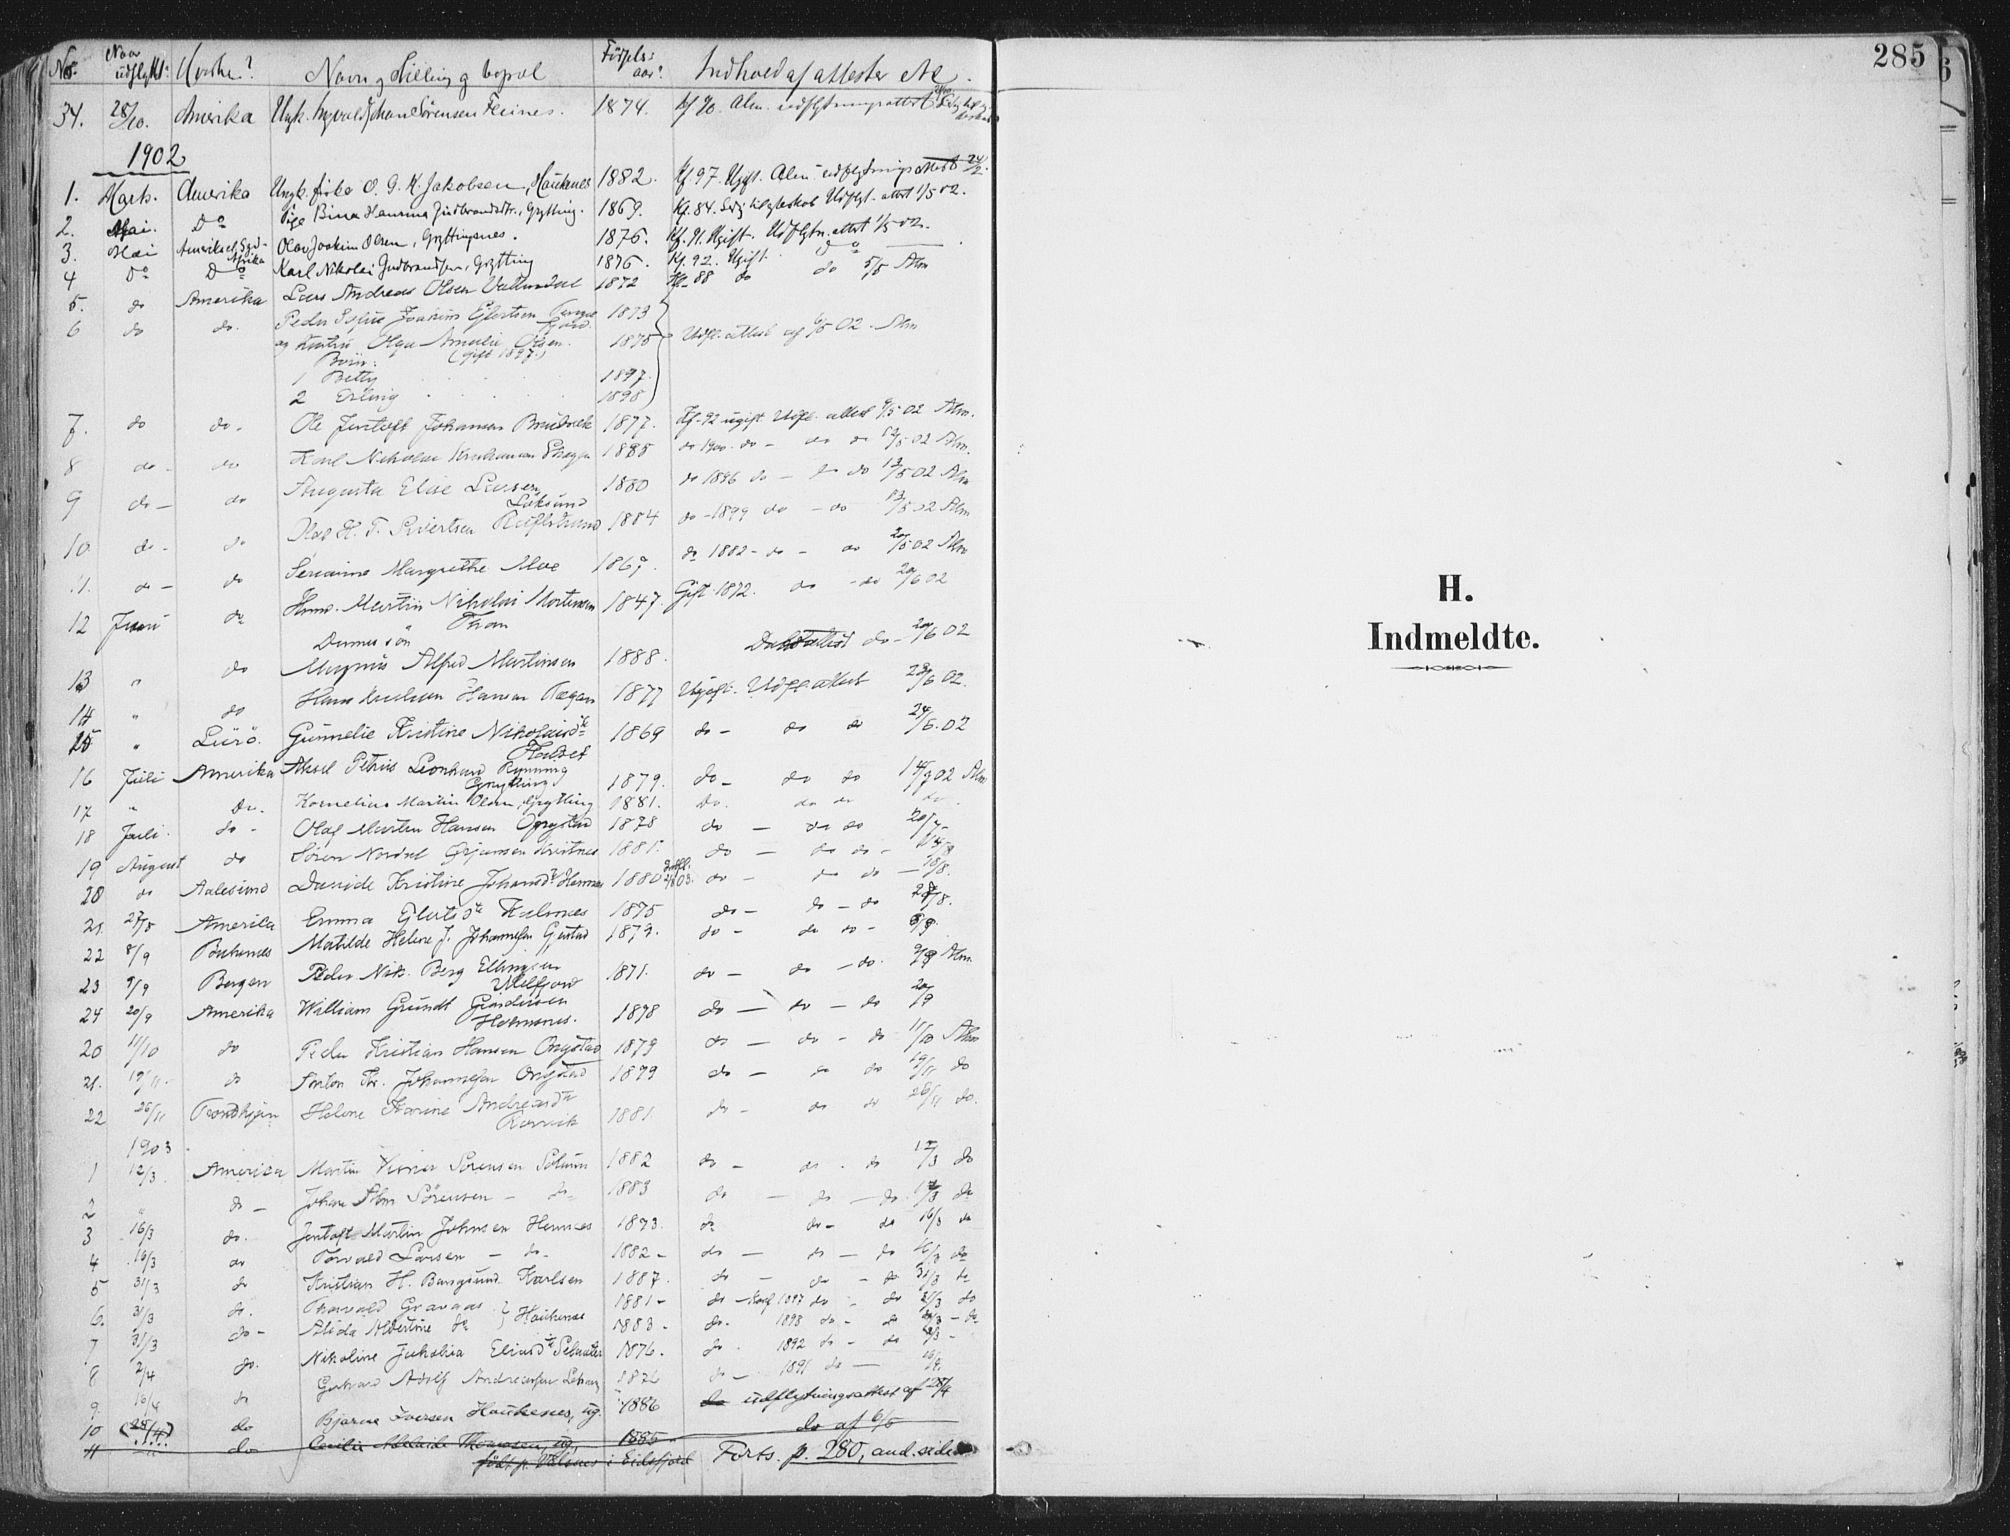 SAT, Ministerialprotokoller, klokkerbøker og fødselsregistre - Nordland, 888/L1246: Ministerialbok nr. 888A12, 1891-1903, s. 285